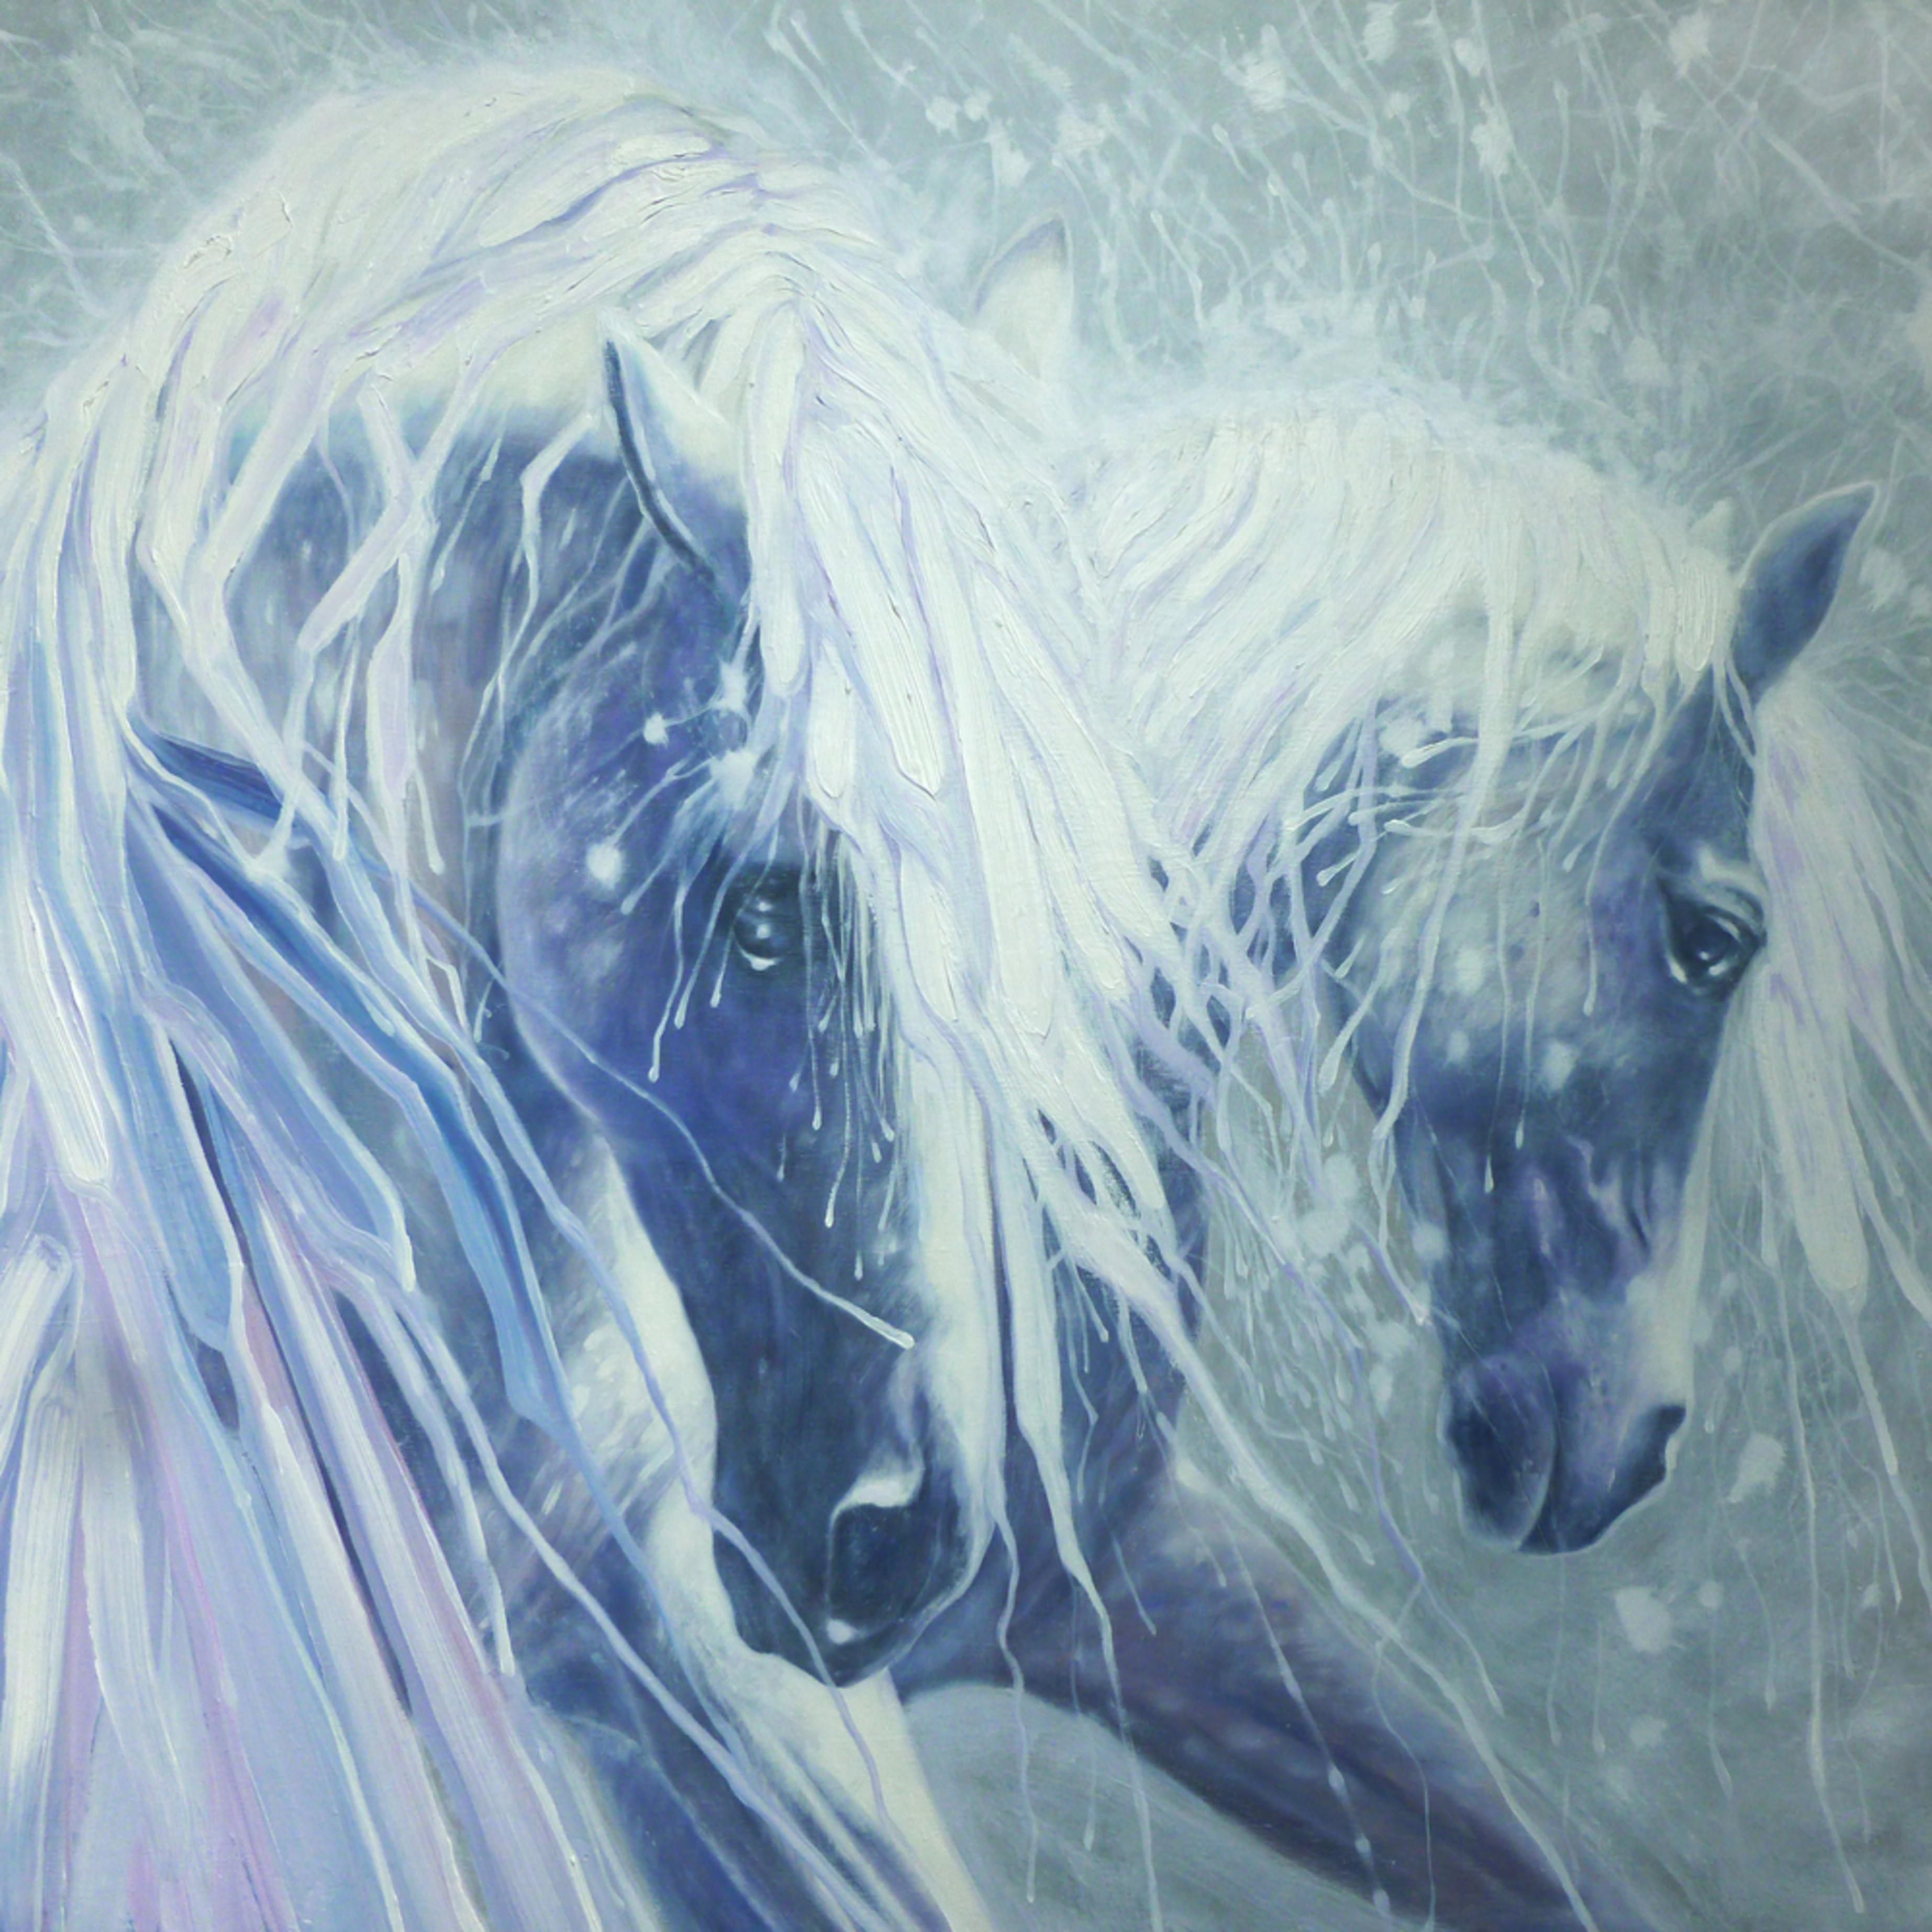 Ice horses square yh5hou